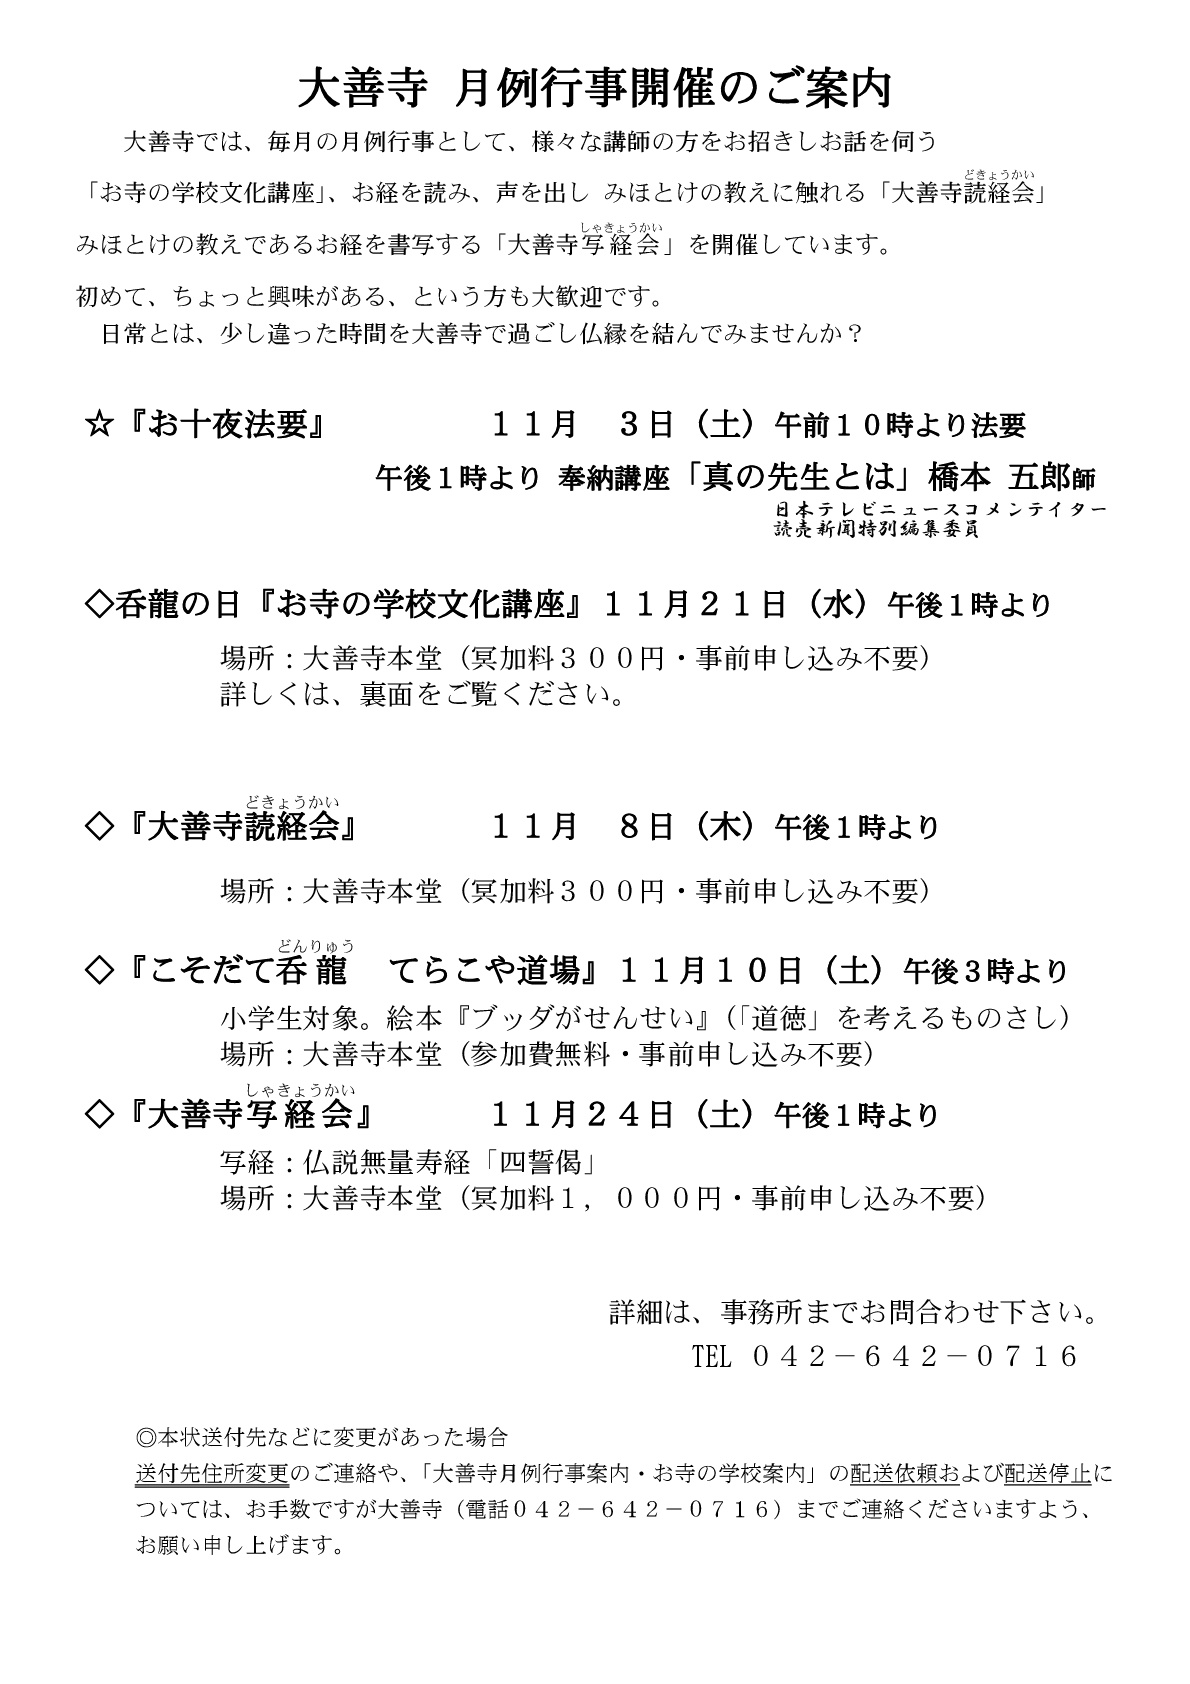 20181022_fujim_2